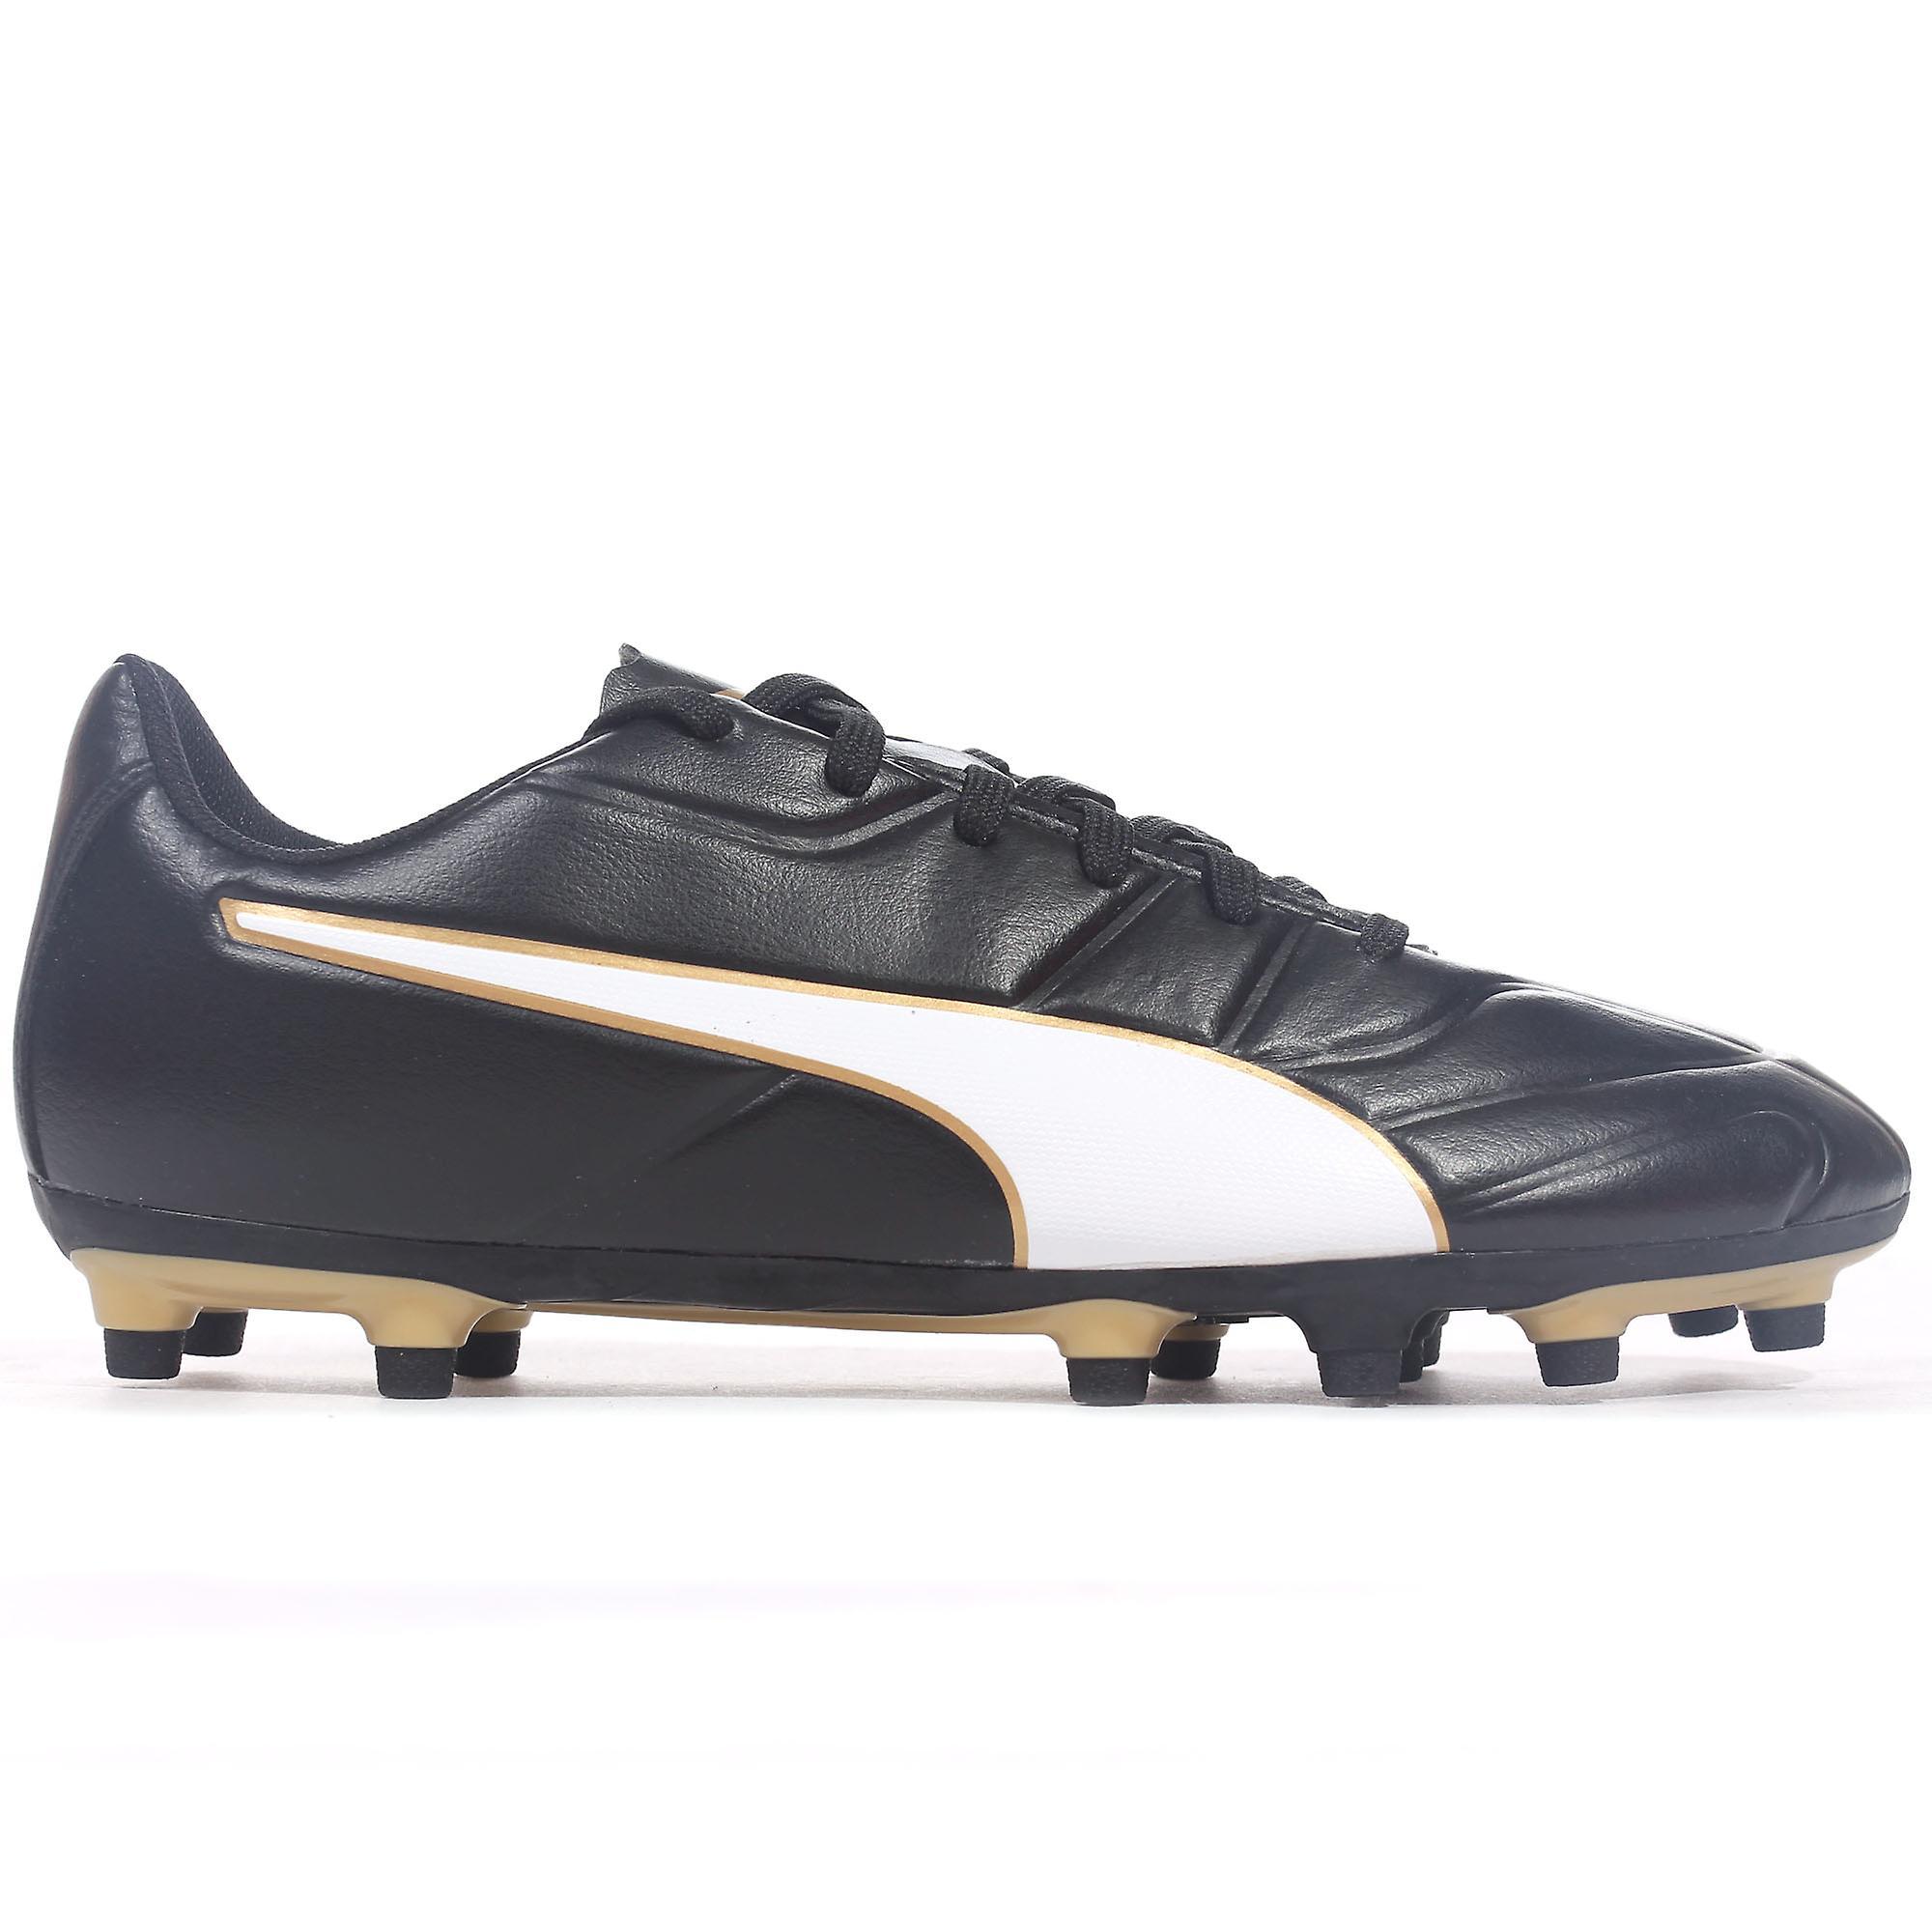 Puma Classico C II FG Firm Ground Mens Football Boot Shoe BlackGold